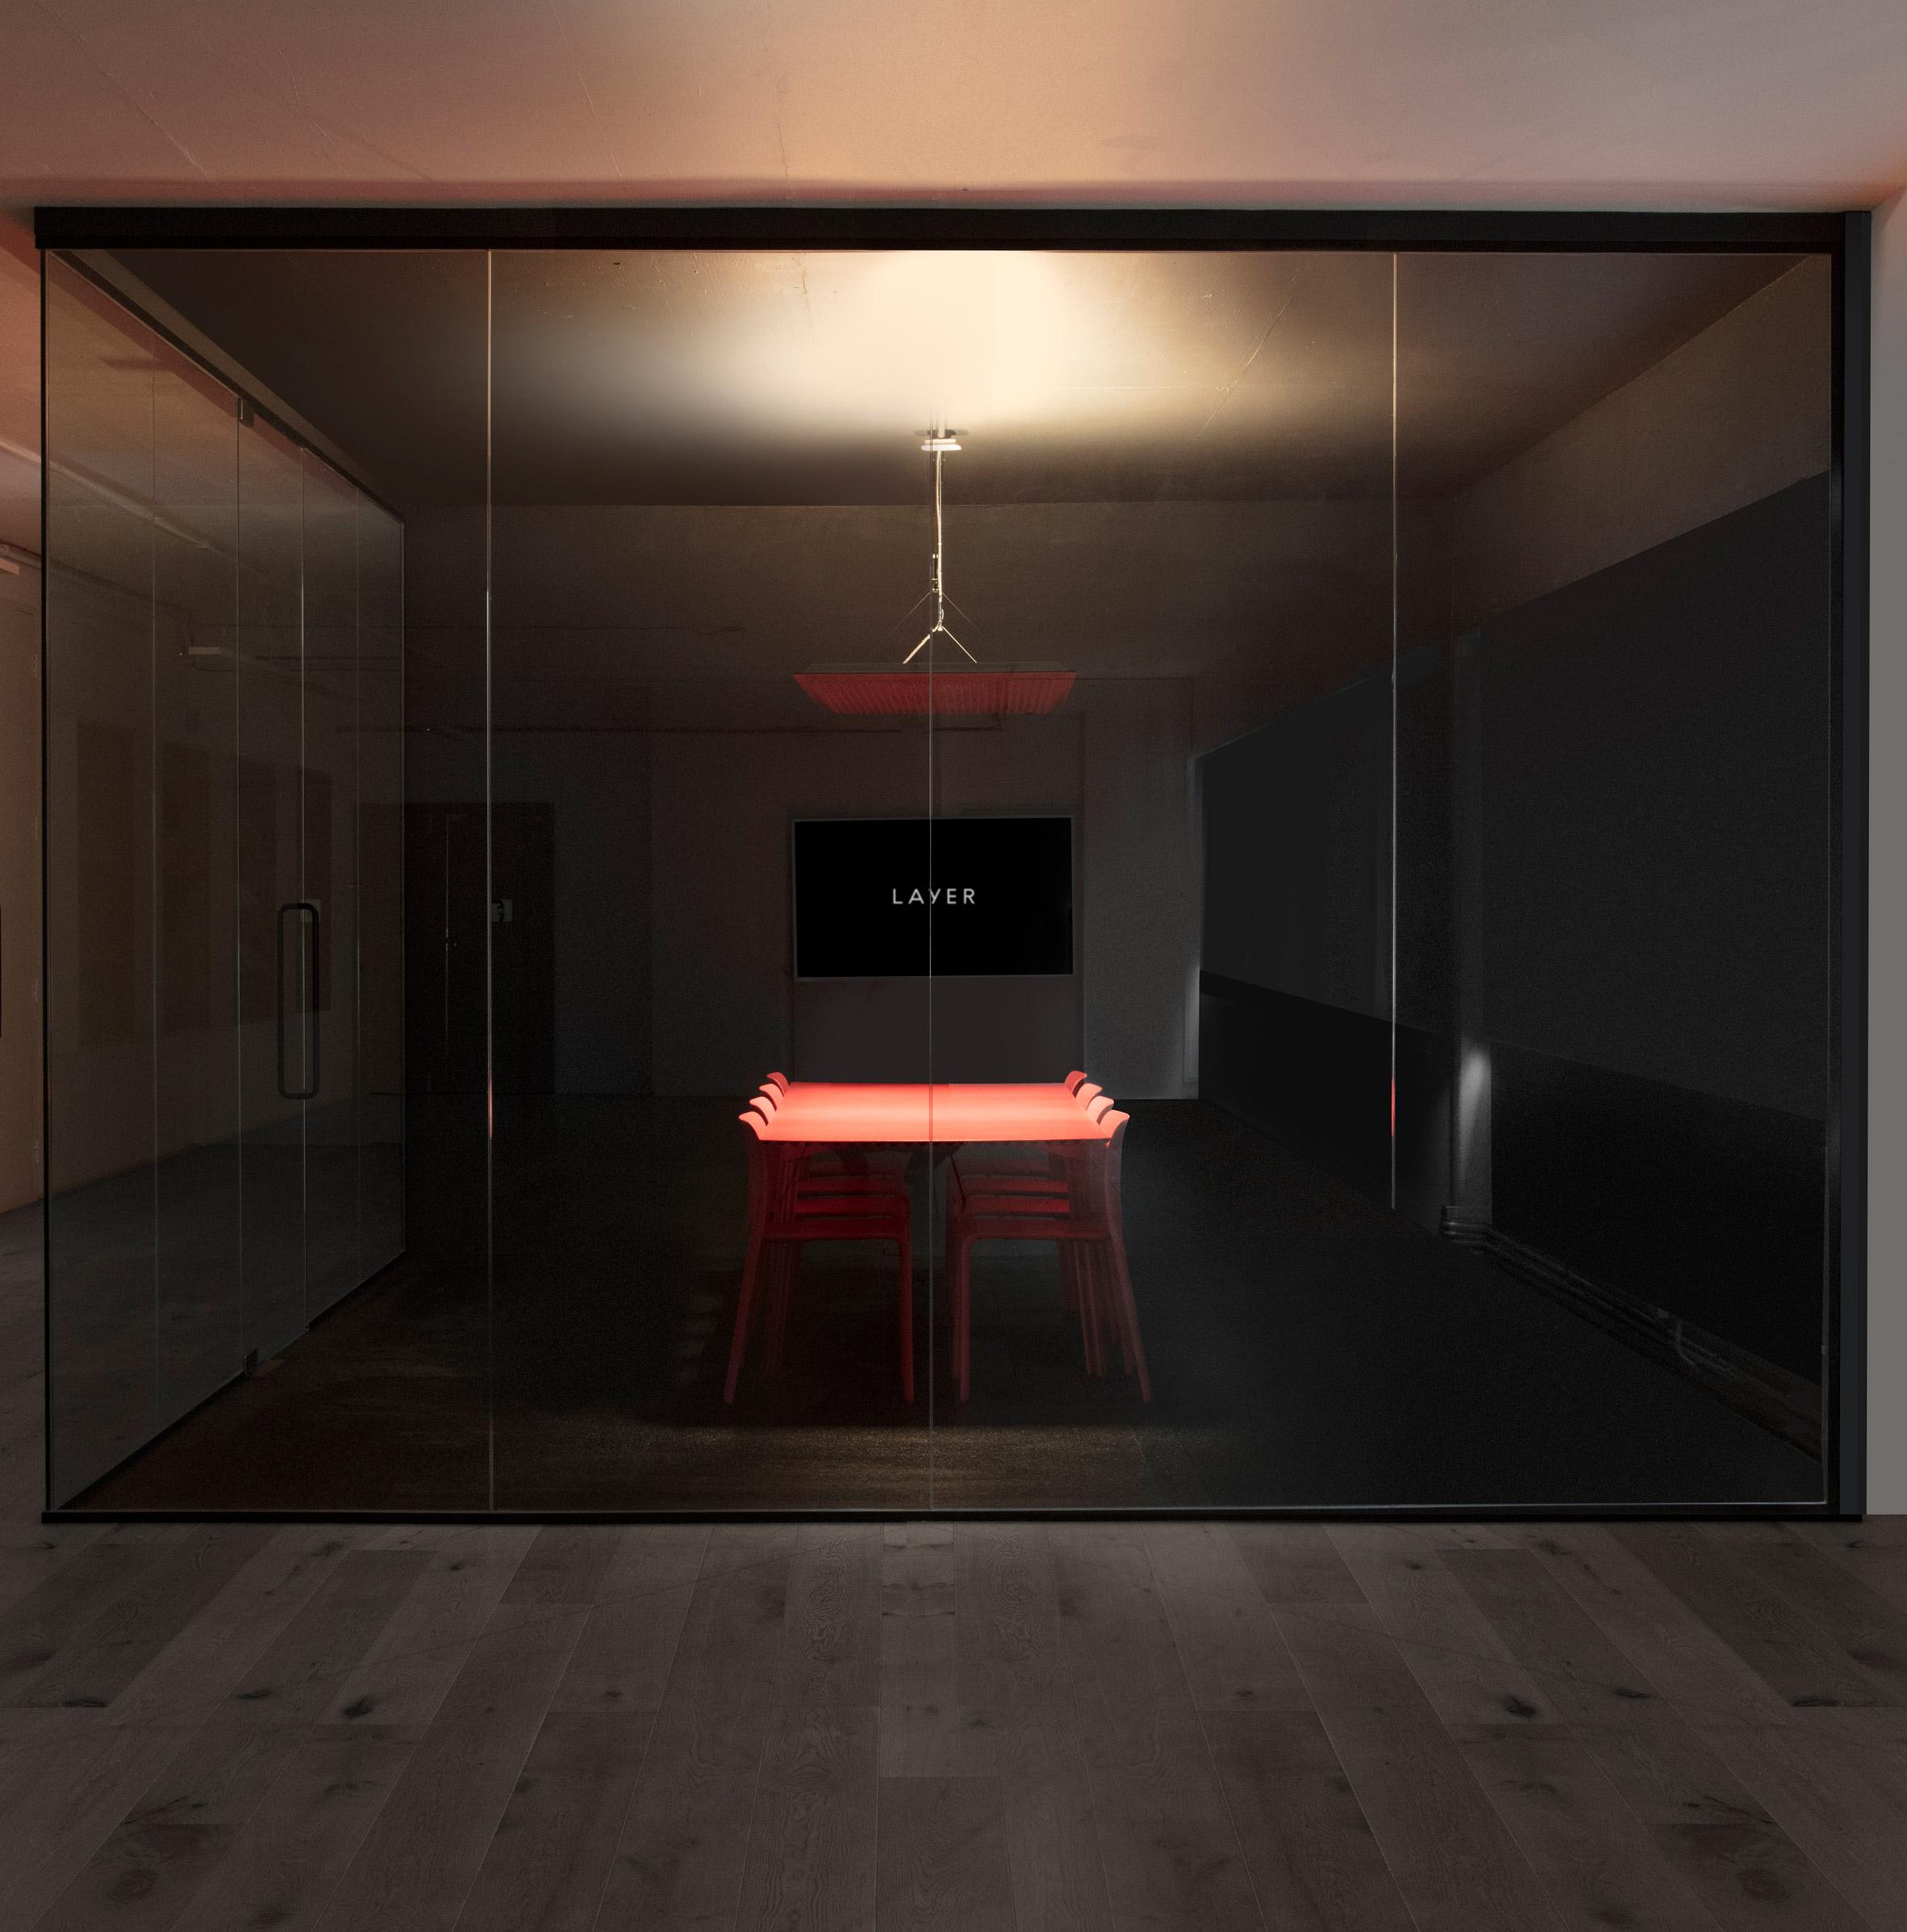 Layer self-designed studio